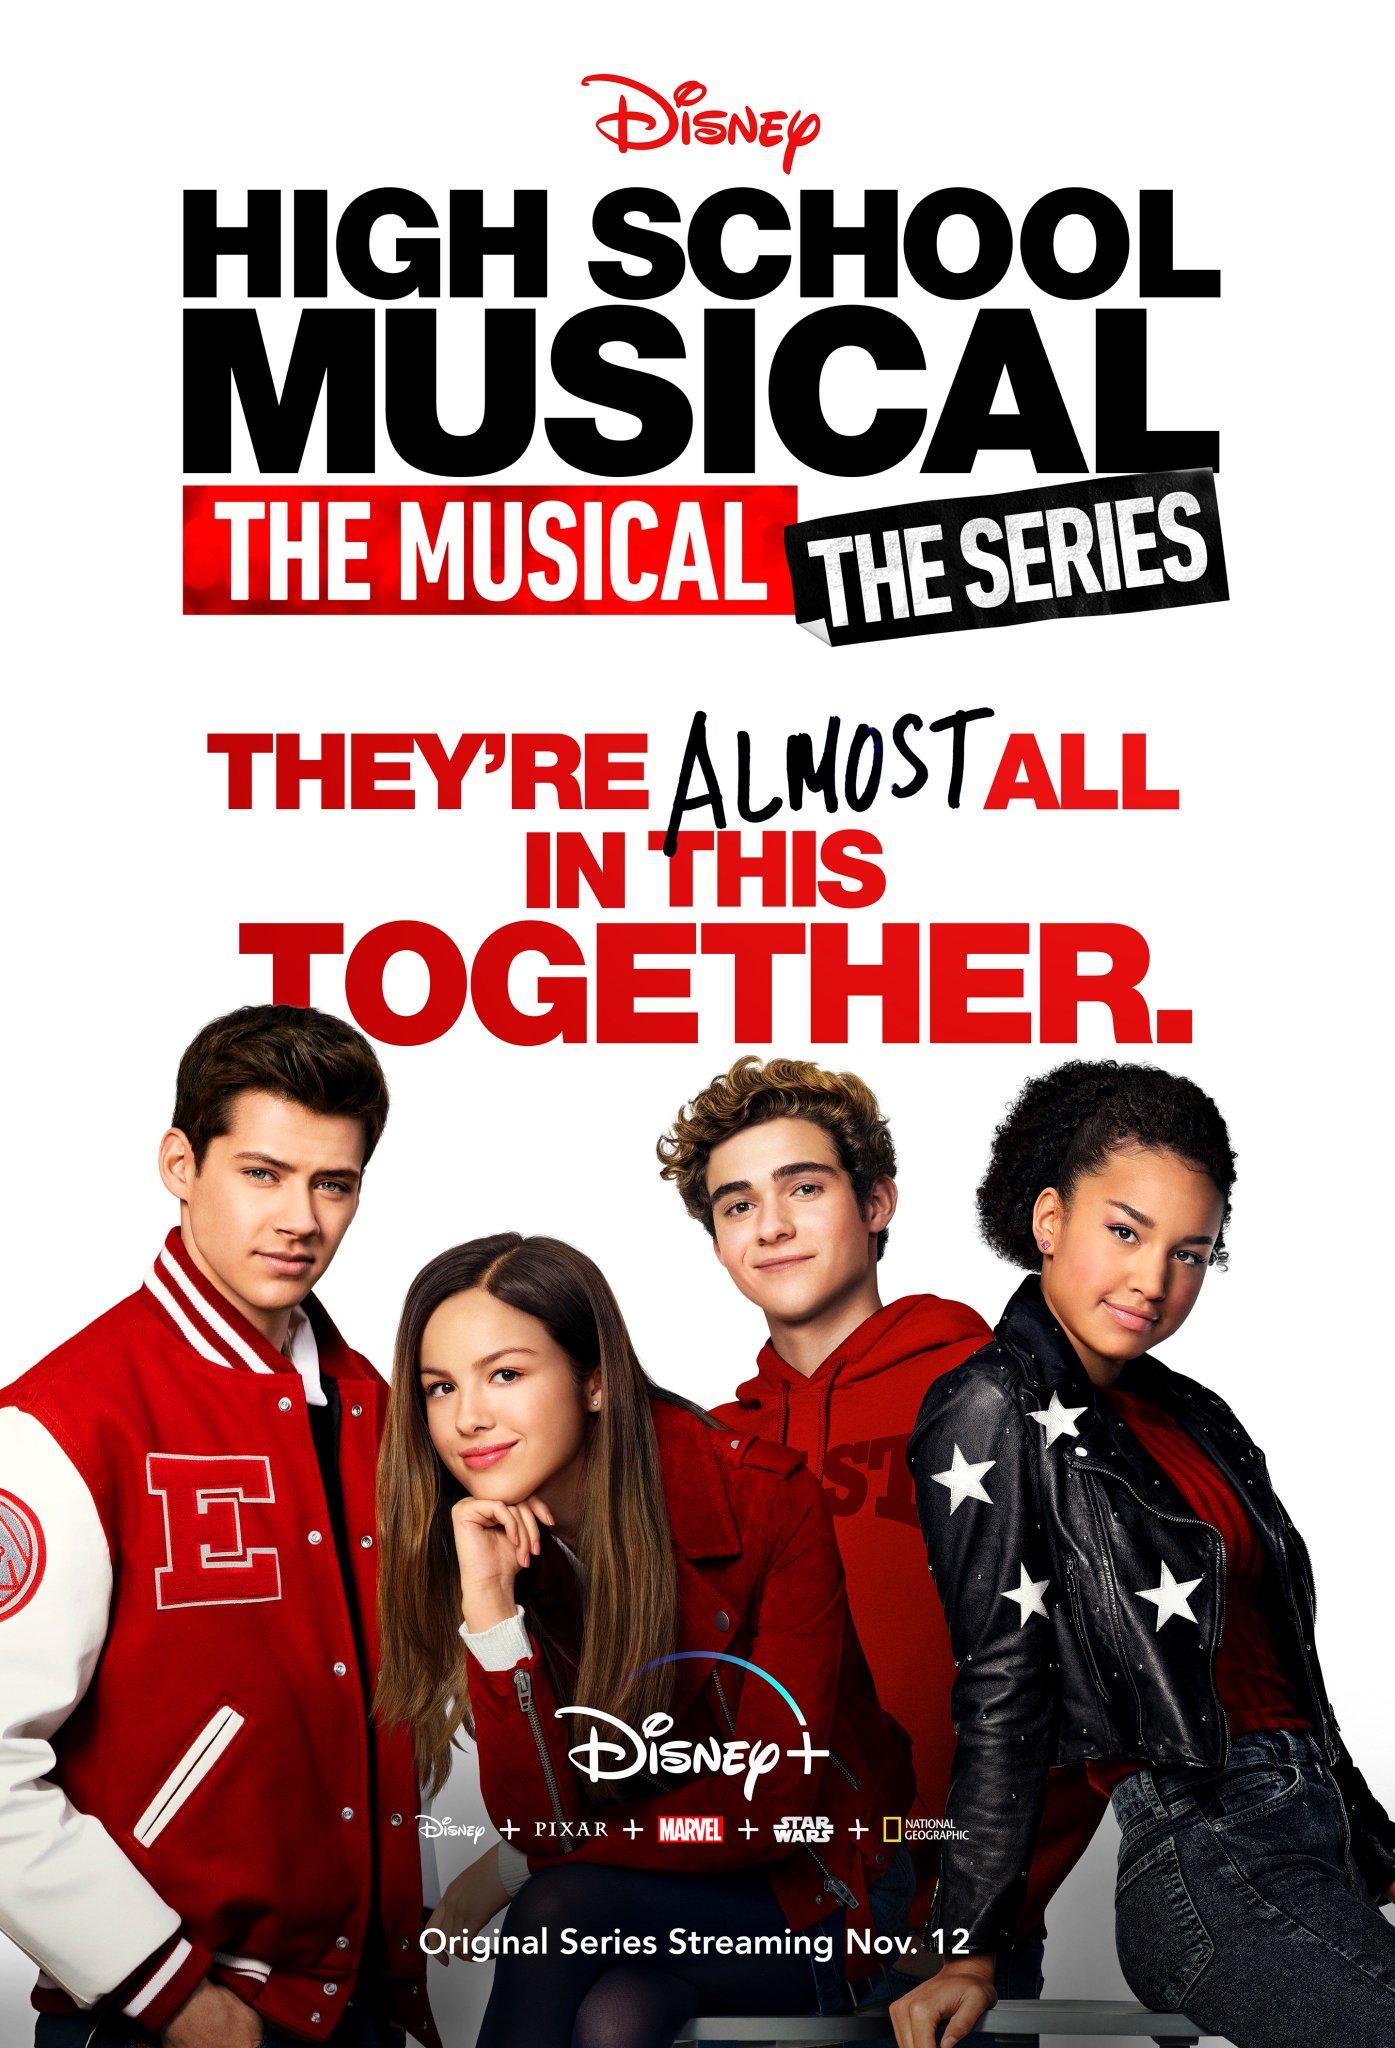 High School Musical 1 Film Complet En Francais : school, musical, complet, francais, Disney, Twitter:, Reboot., Sequel., Start, Something, School, Musical:, Series., Streaming, November, #DisneyPlus.…, Https://t.co/gamXk5xB1o